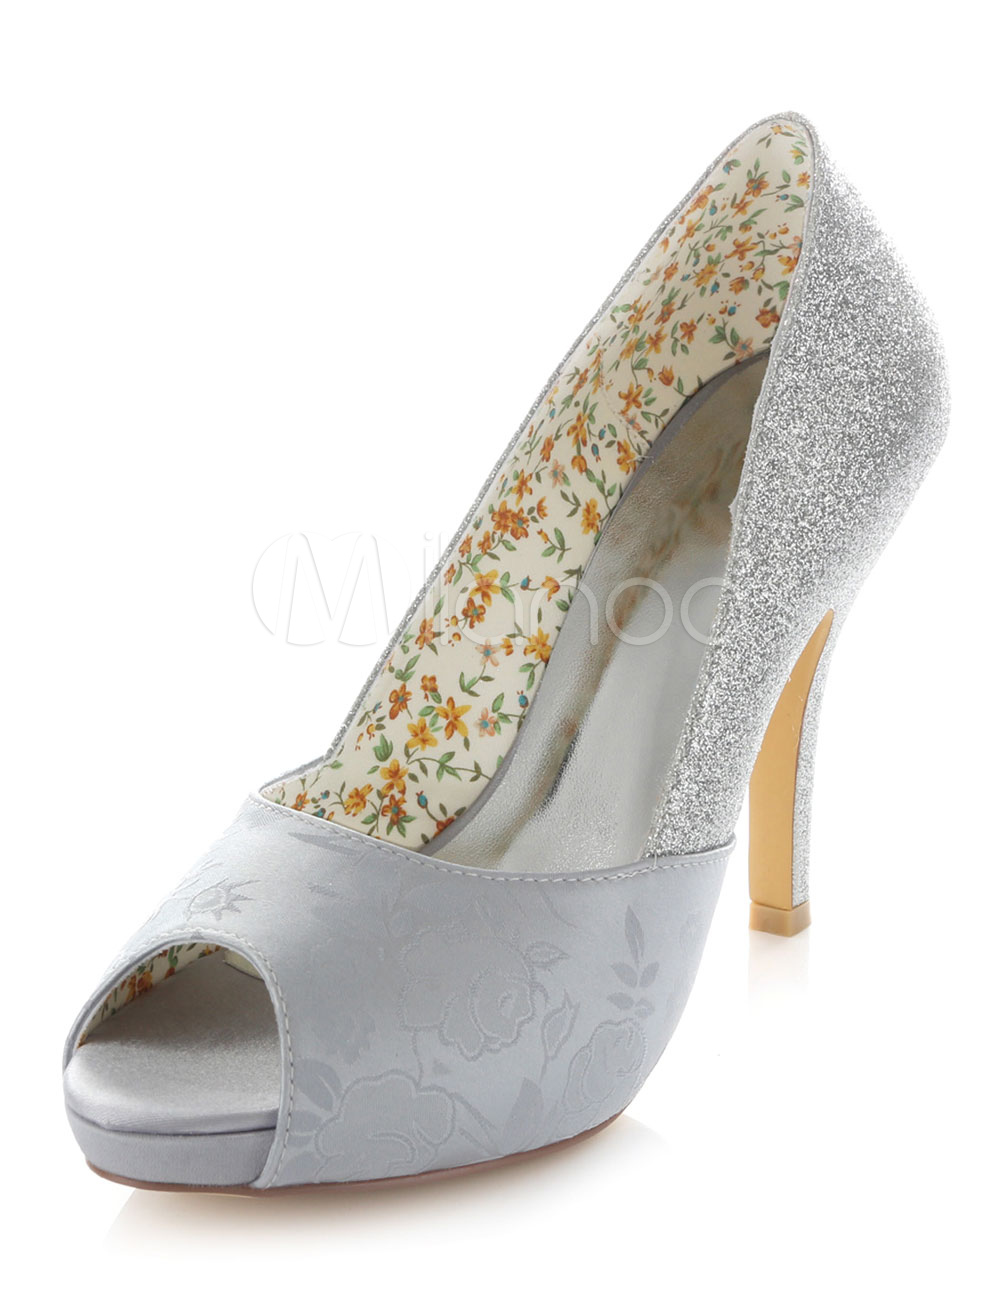 2556eb47a67 Peep Toe Bridal Pumps Silver Print Satin Wedding Heels for Women ...